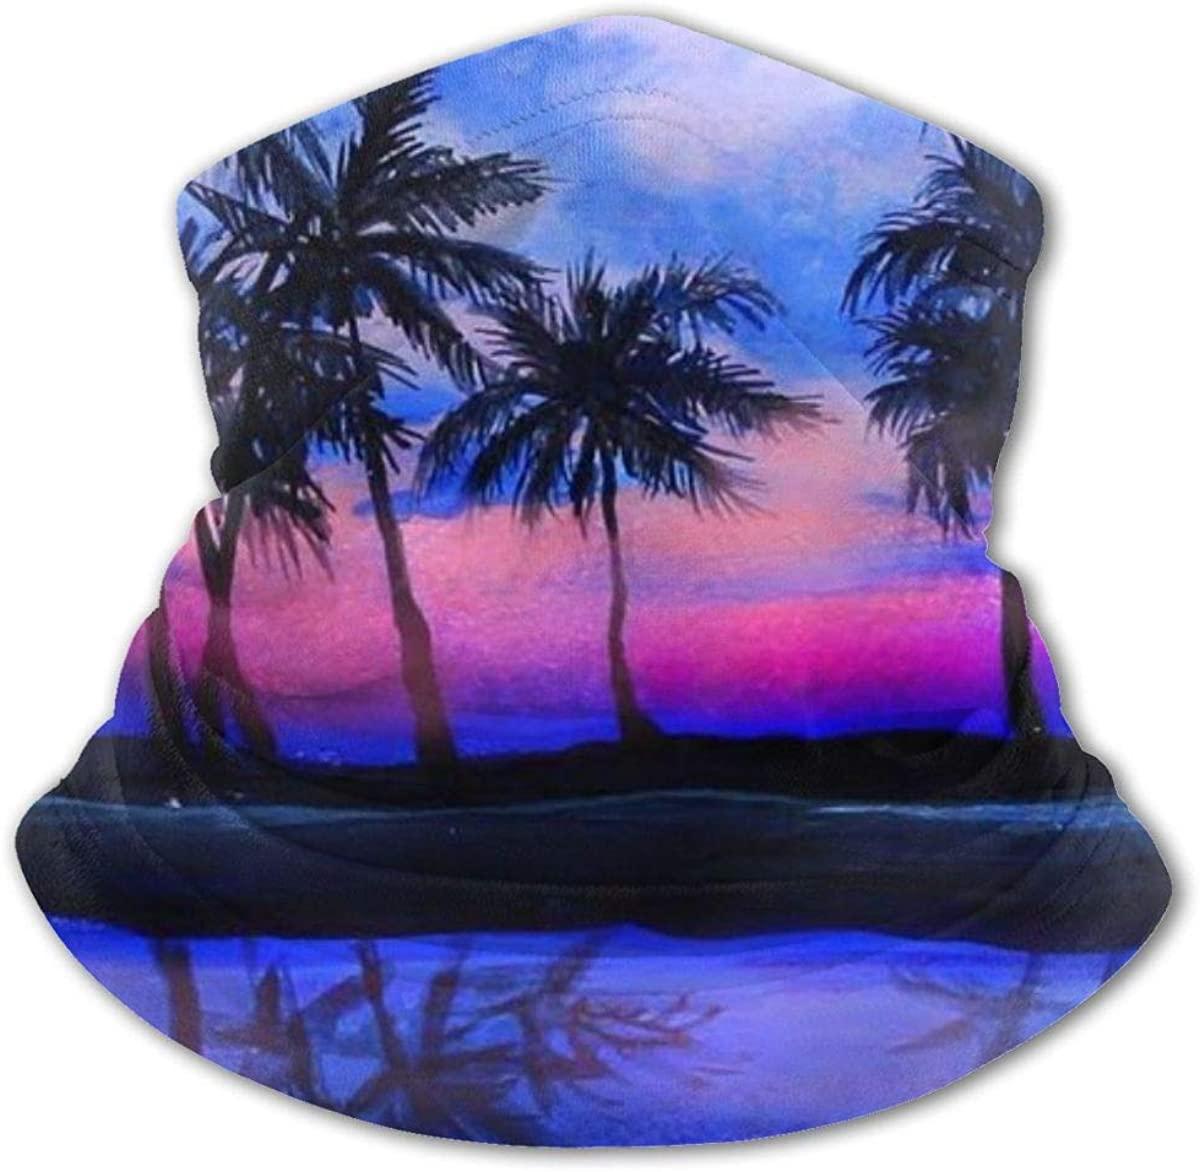 Sunset And Palm Tree Headwear For Girls And Boys, Head Wrap, Neck Gaiter, Headband, Tenn Fishing Mask, Magic Scarf, Tube Mask, Face Bandana Mask For Camping Running Cycling